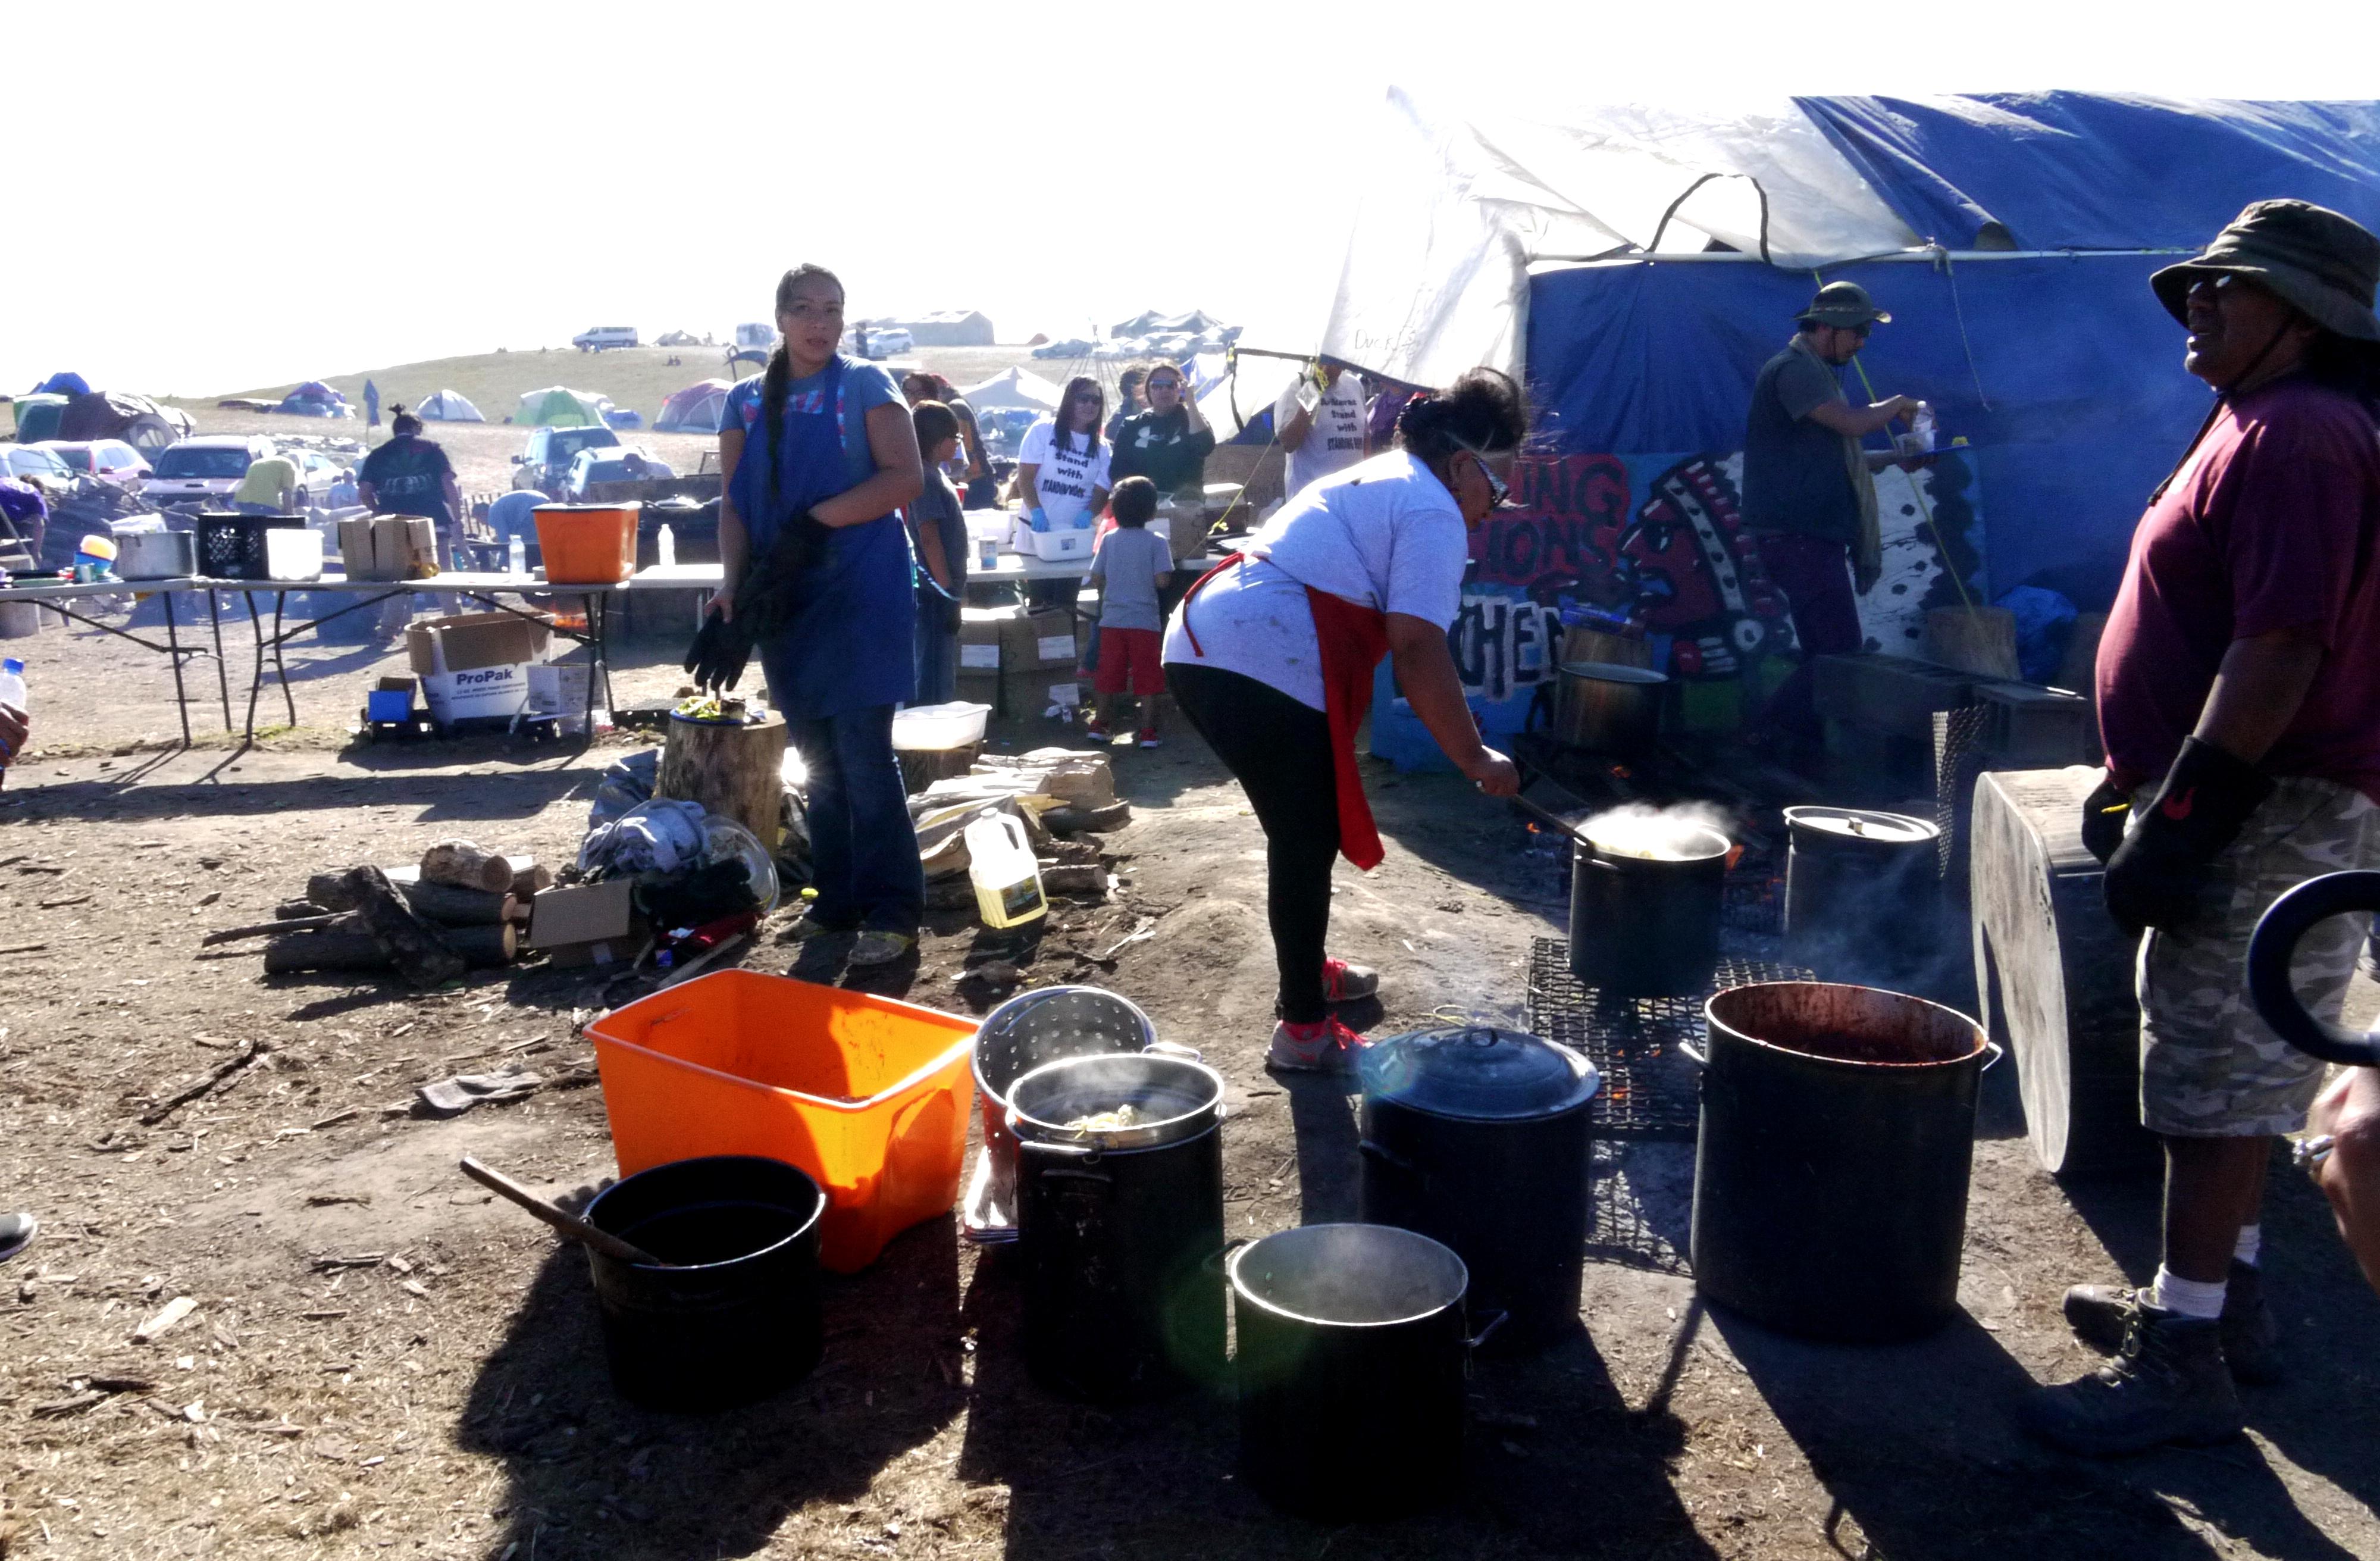 The kitchen at the Oceti Sakowin camp, Sept. 14, 2016. (Sarah Jaffe for BillMoyers.com)